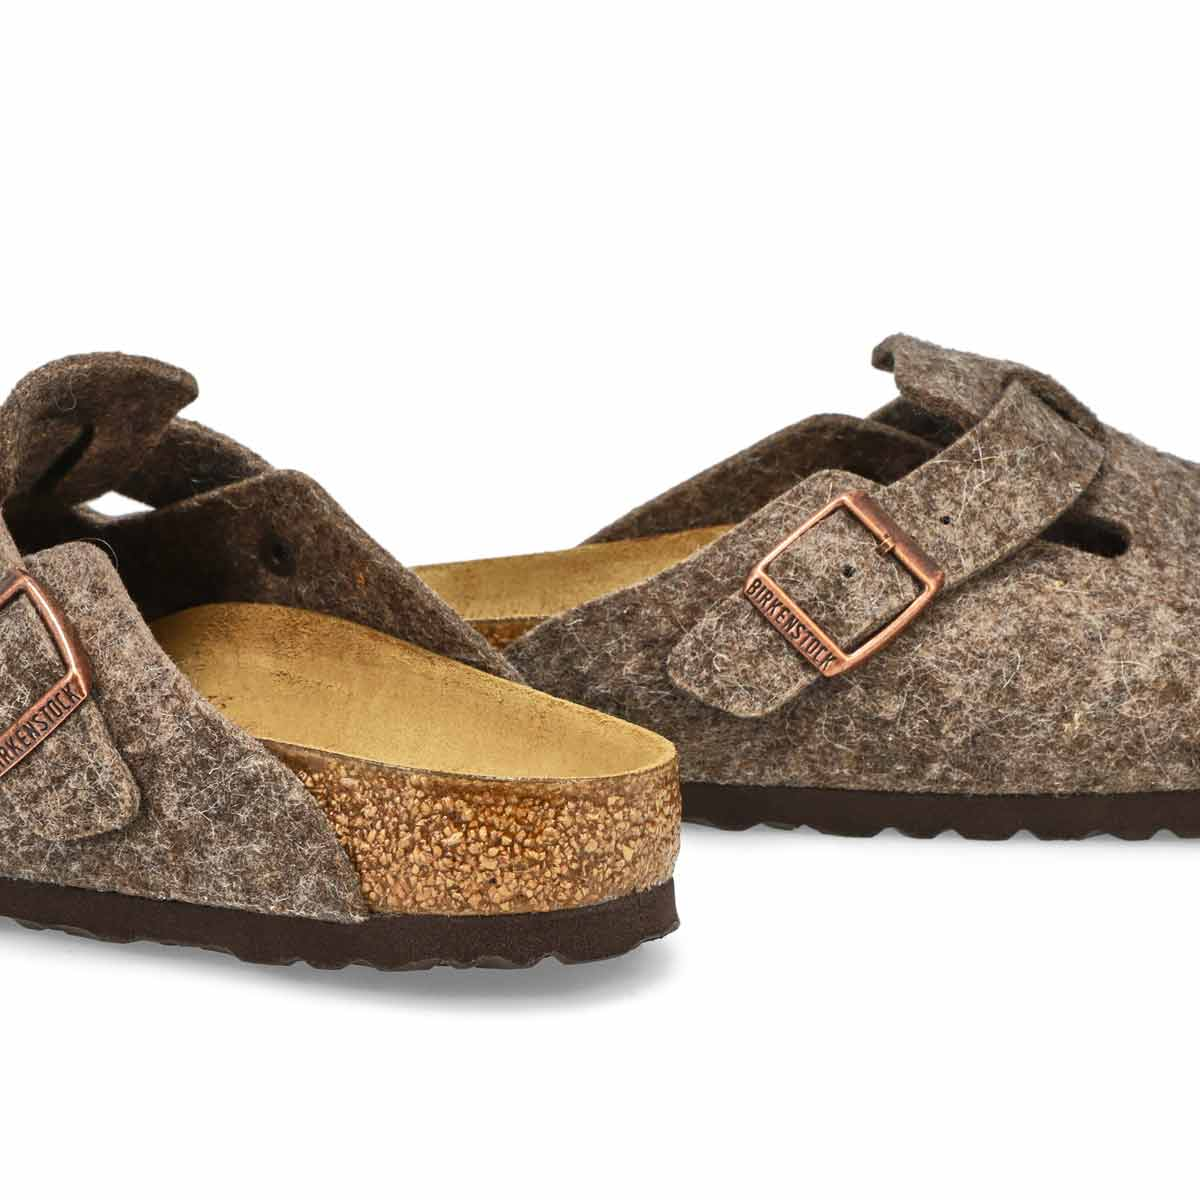 Women's BOSTON cocoa wool clogs - Narrow